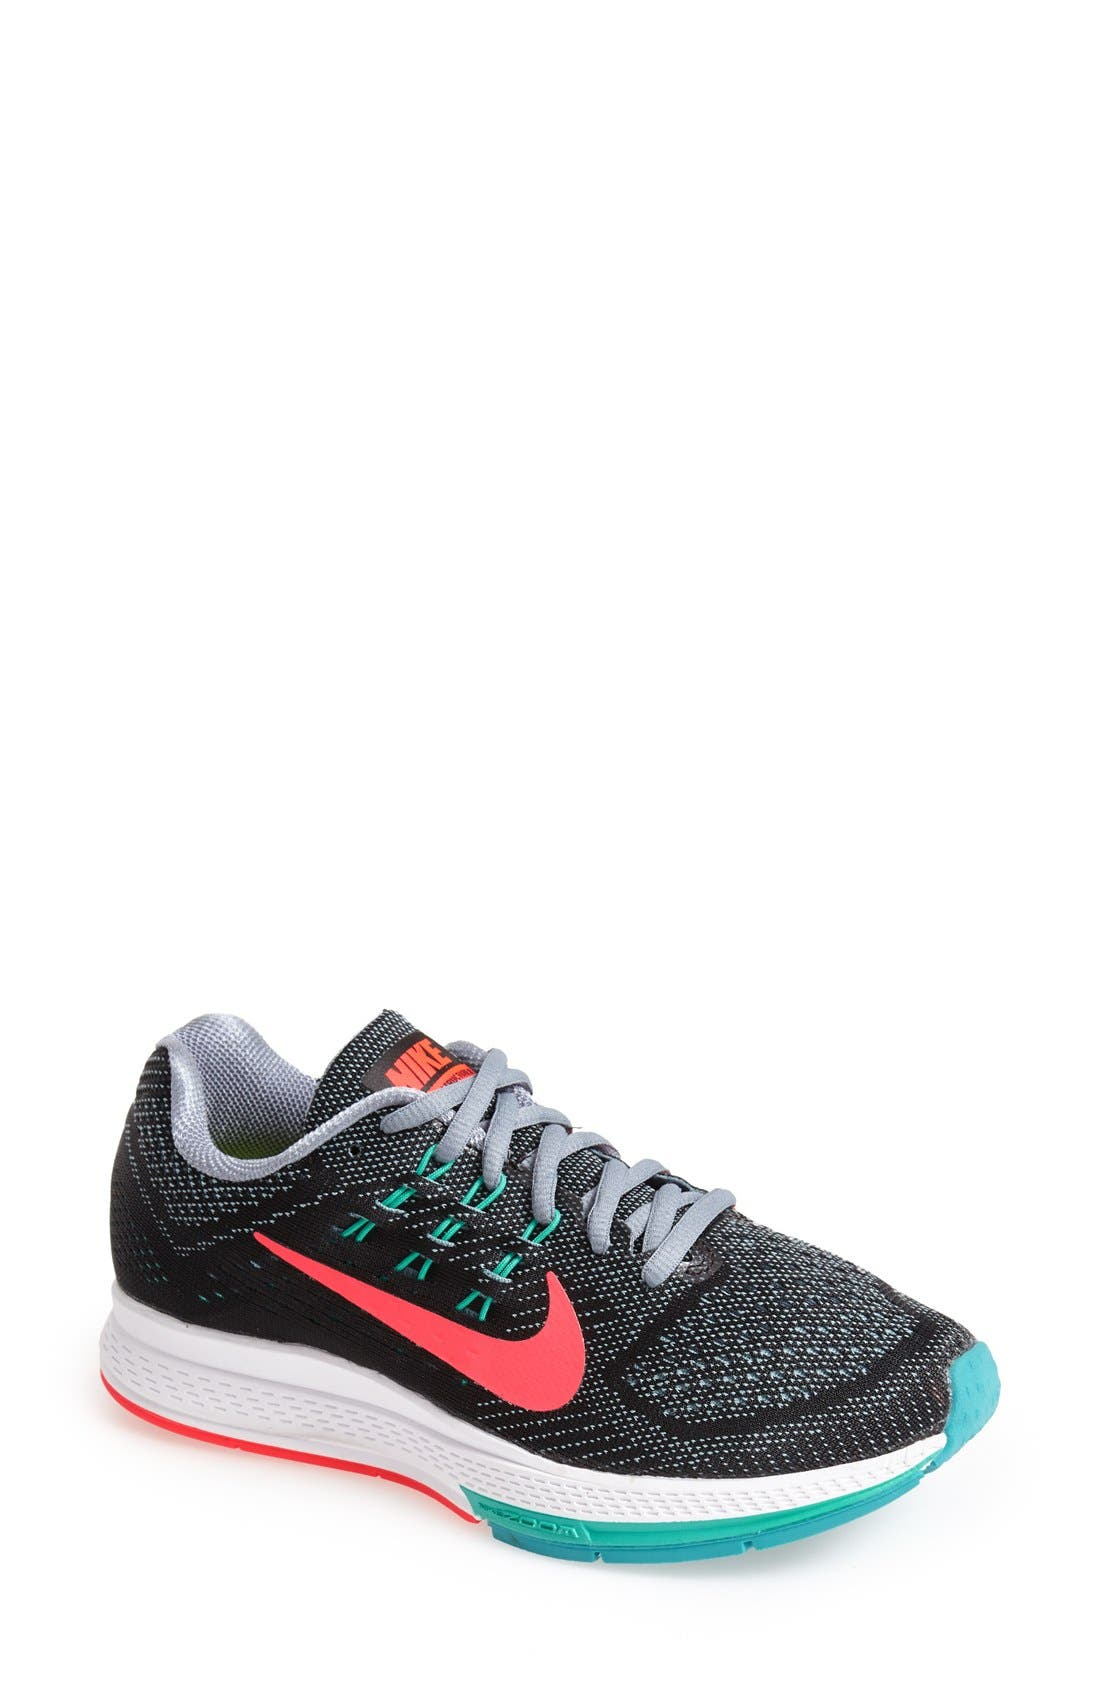 Main Image - Nike 'Air Zoom Structure 18' Running Shoe (Wide) (Women)